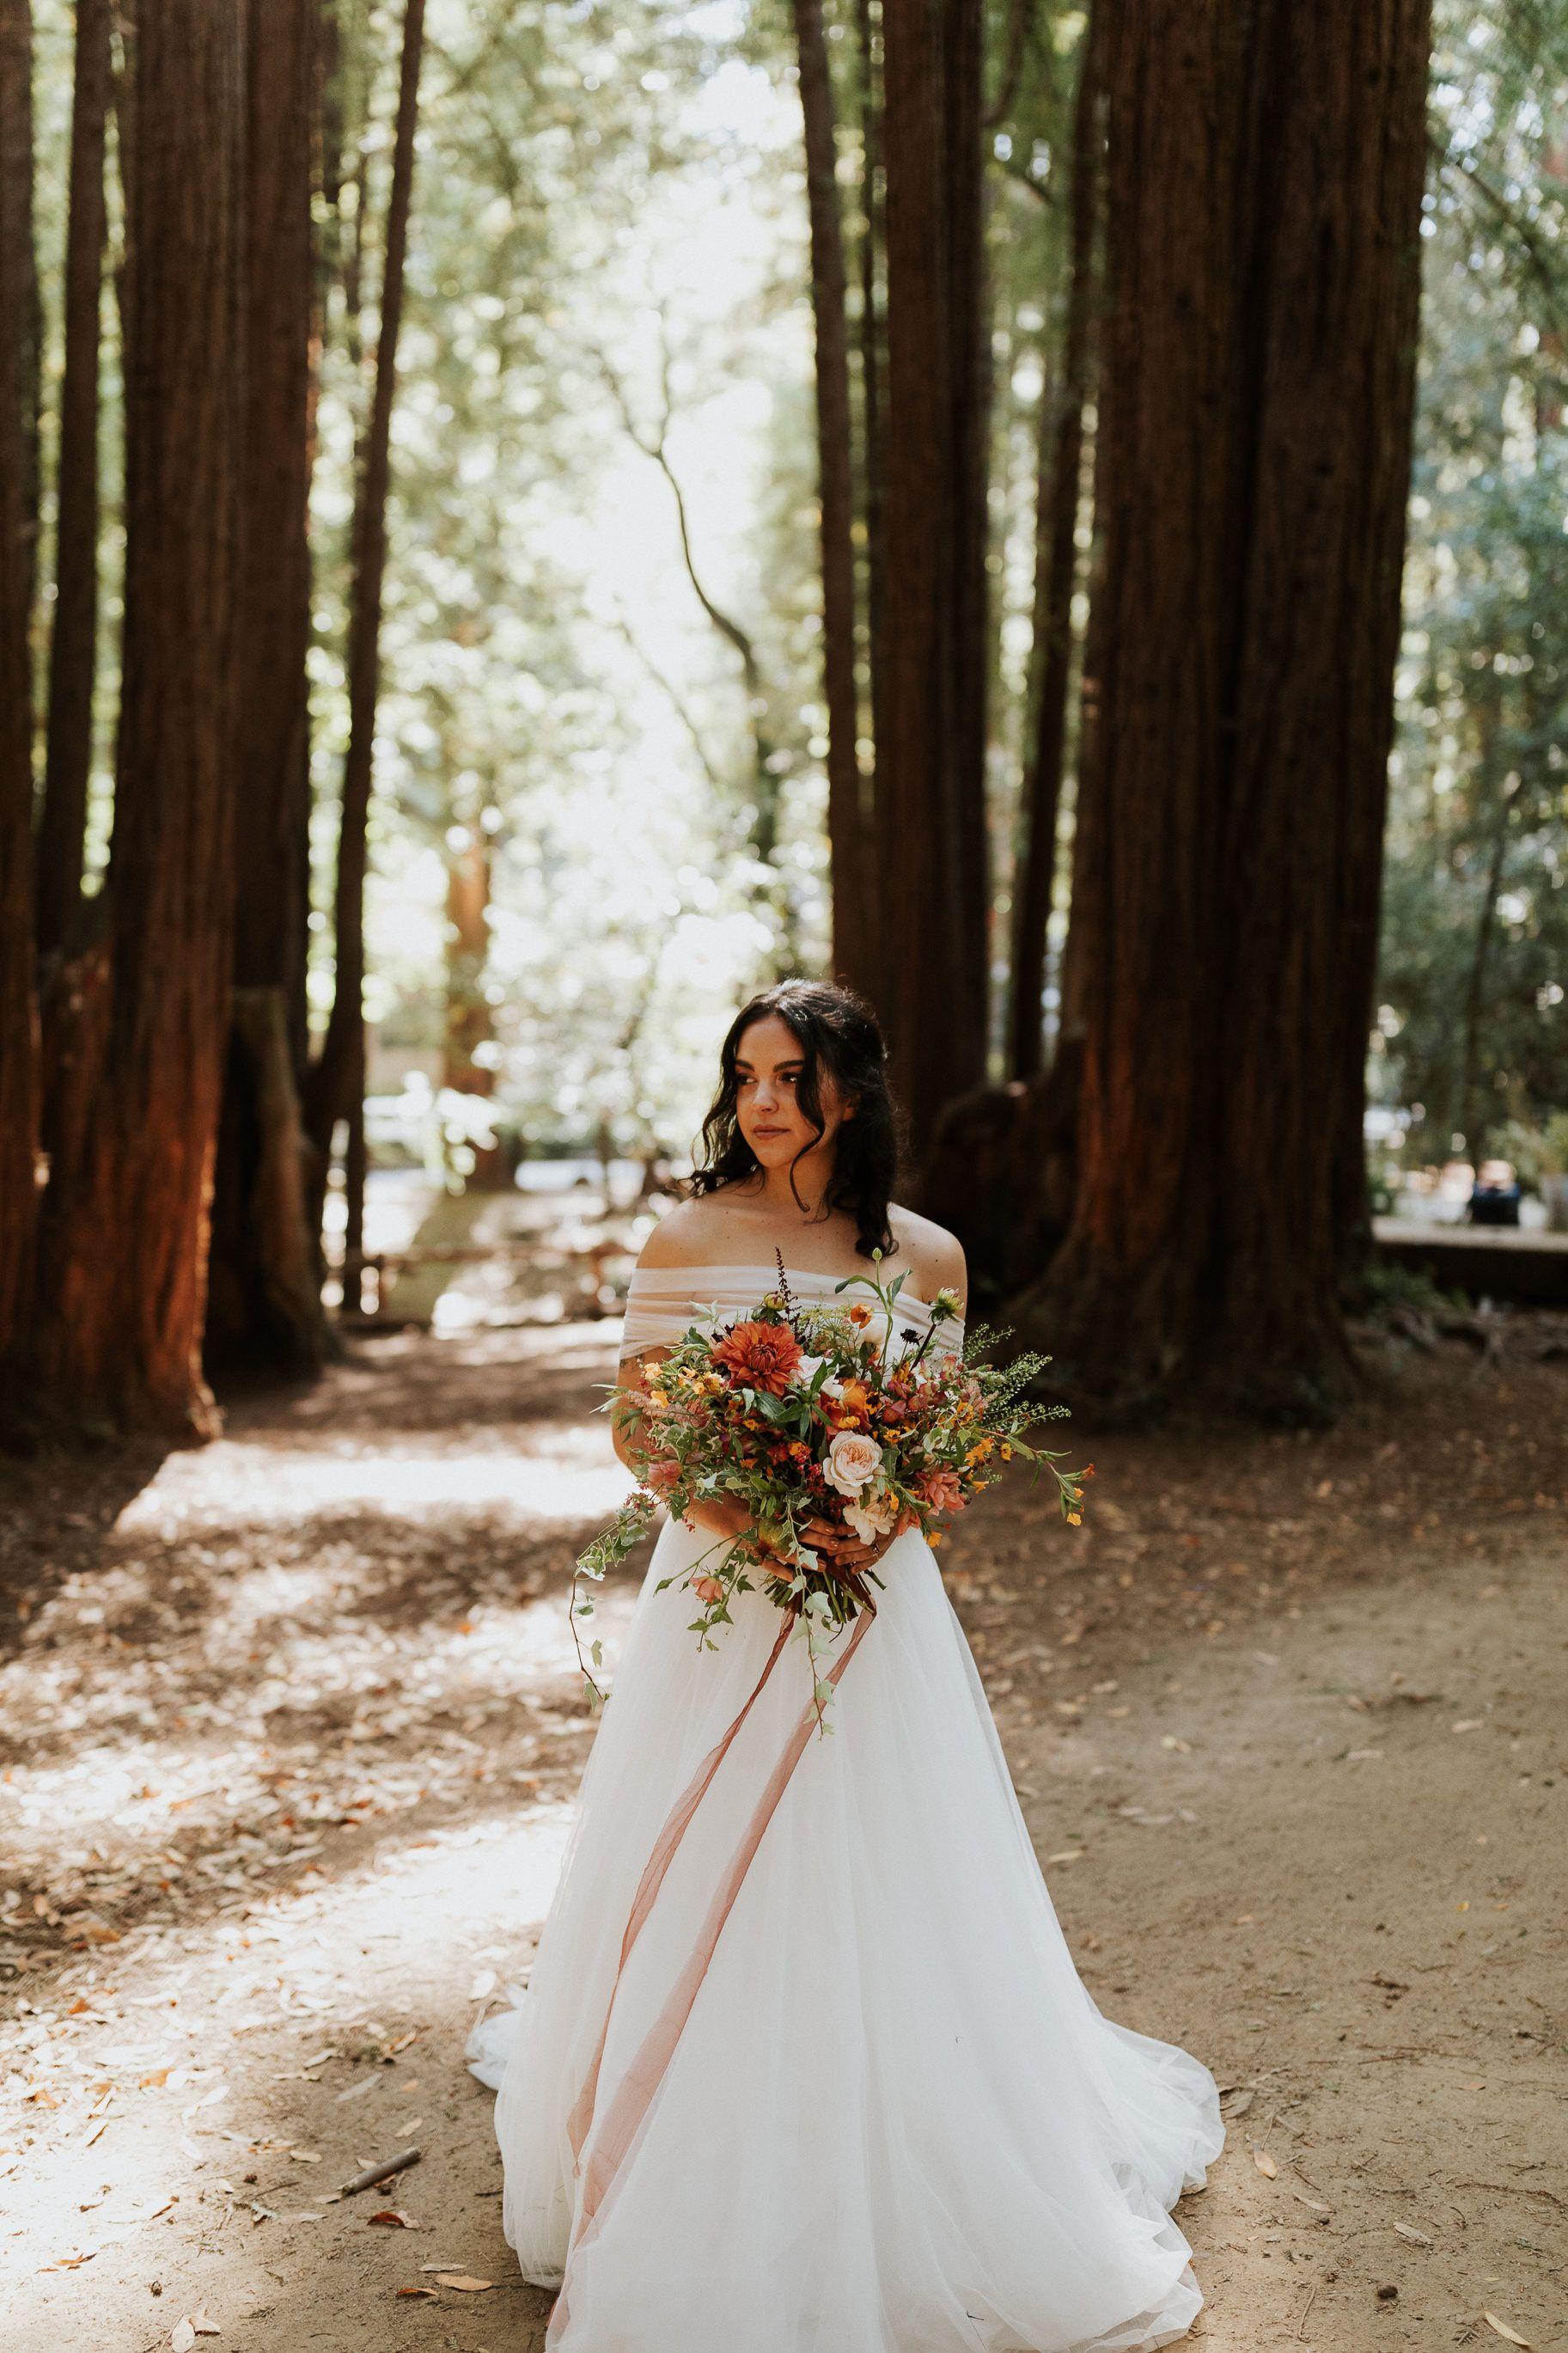 Jillian Gown From Bhldn Forest Wedding Dress Bhldn Bride Wedding [ 2738 x 1825 Pixel ]